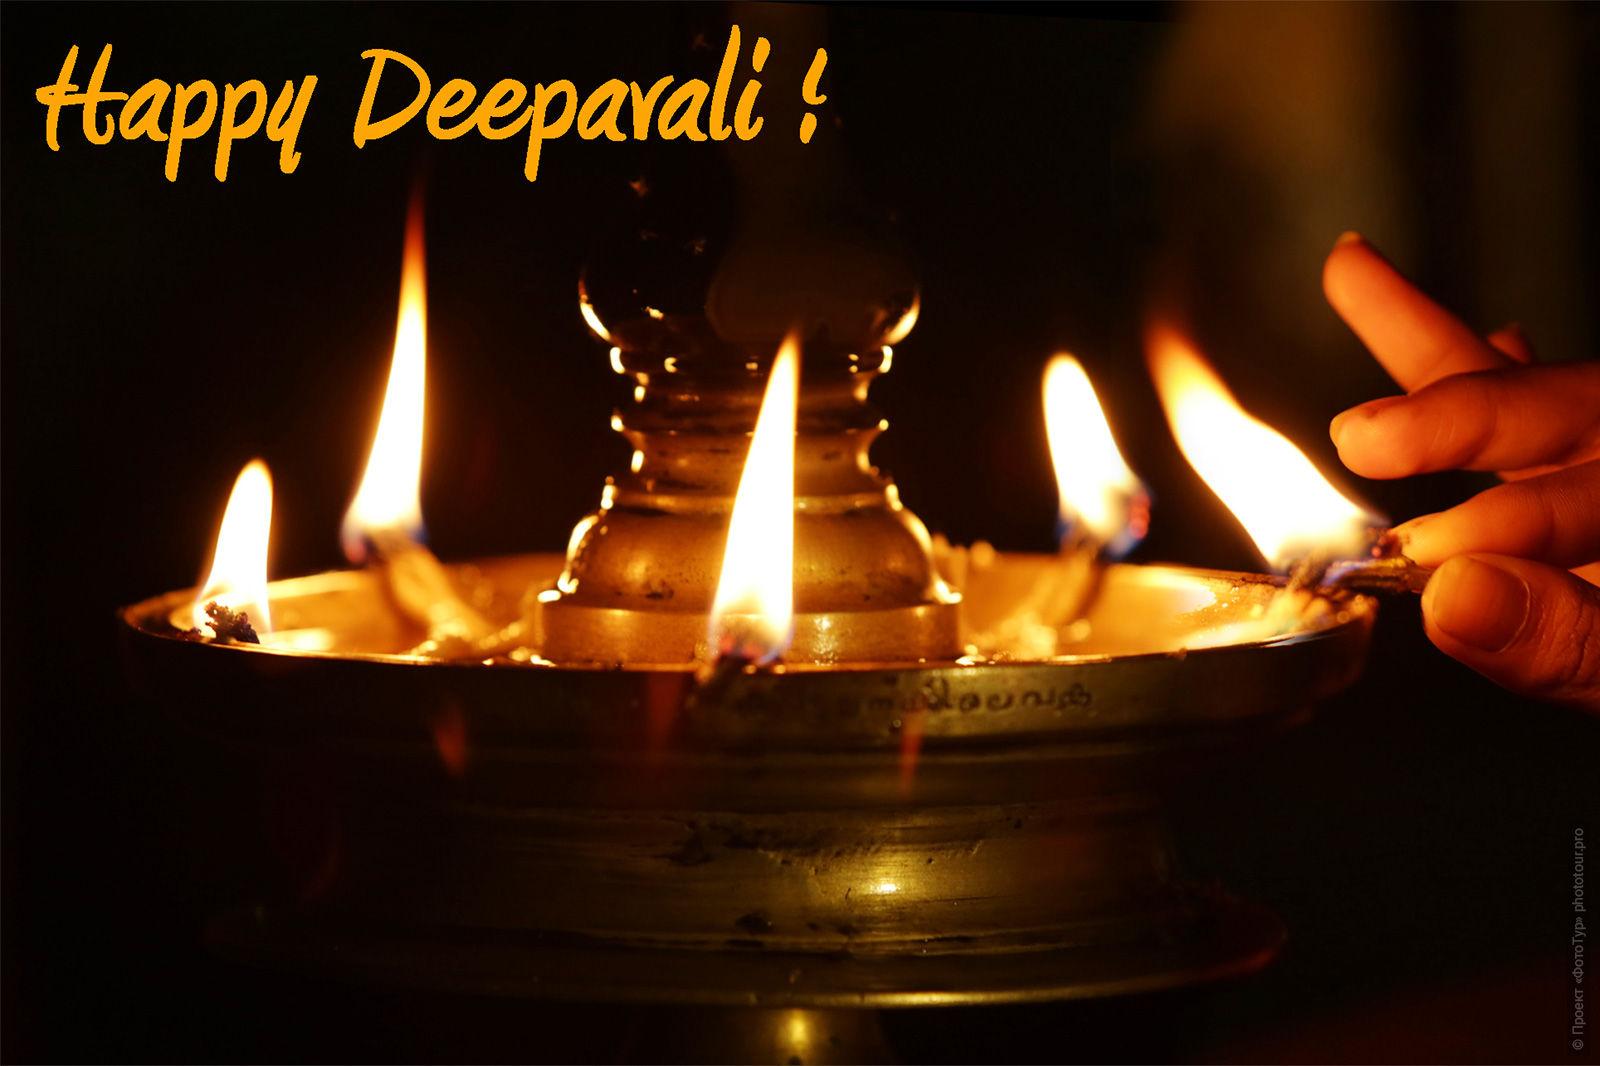 Картинки по запросу Дивали или Дипавали (Diwali или Deepavali) картинки